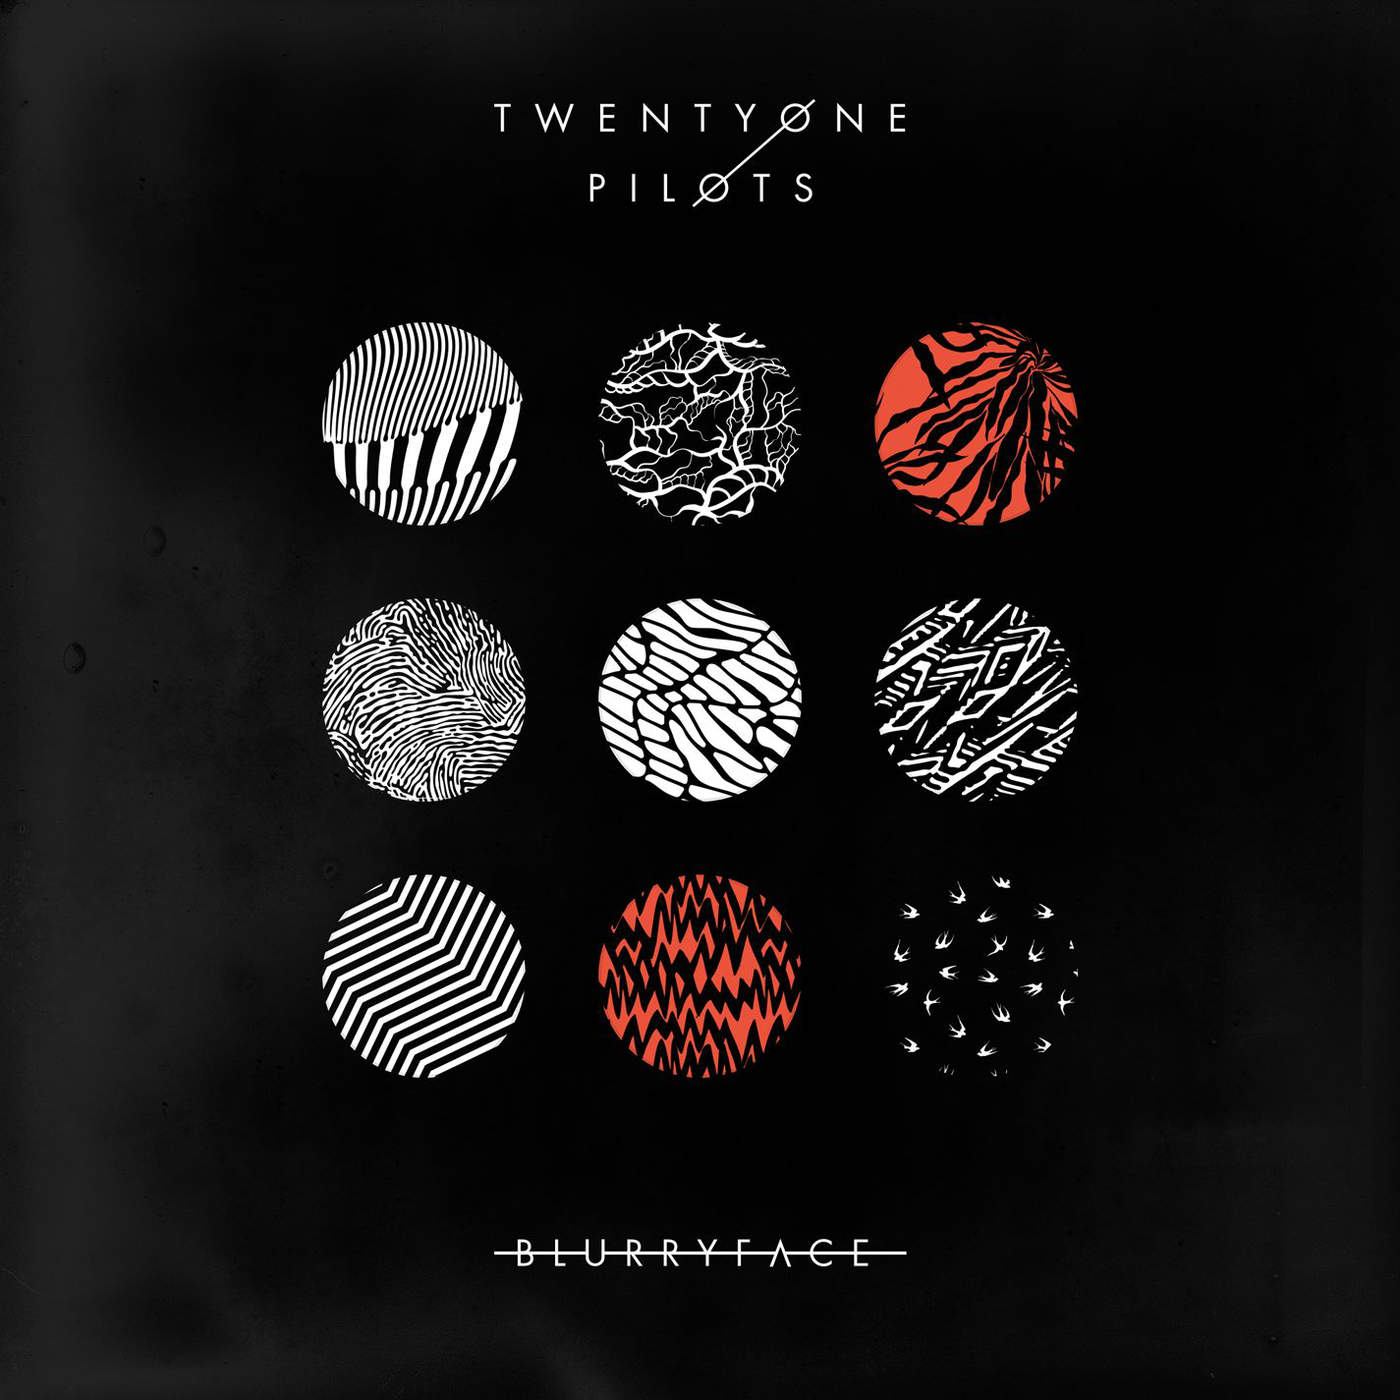 twenty one pilots - Blurryface Cover